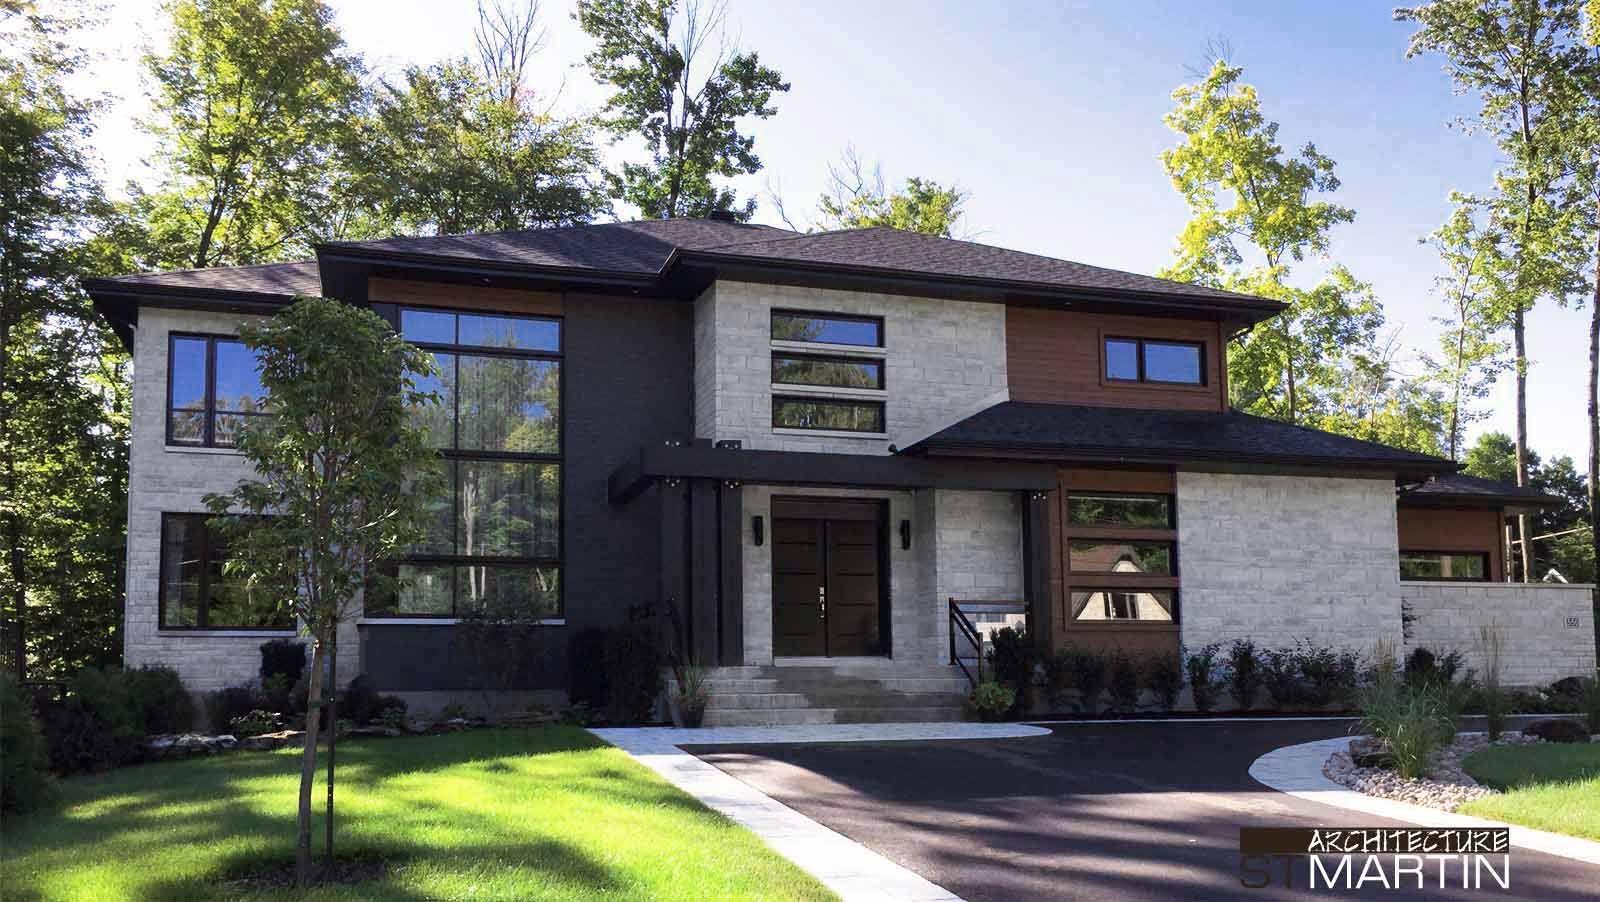 Architecture stmartin maisons neuves home pinterest house